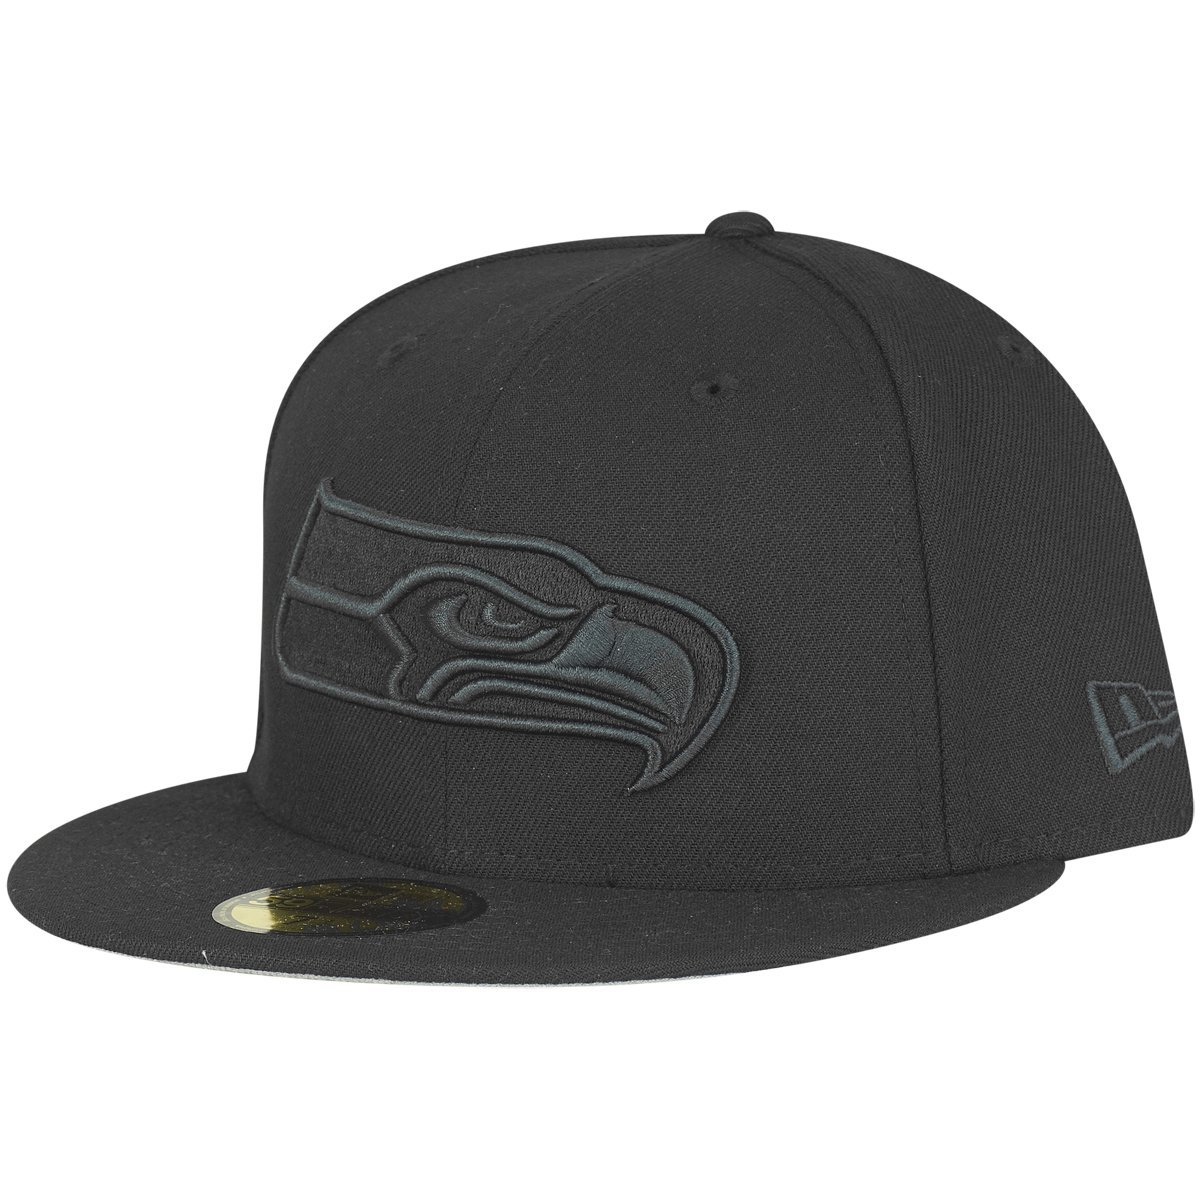 New Era 59Fifty Fitted Cap - NFL Seattle Seahawks noir